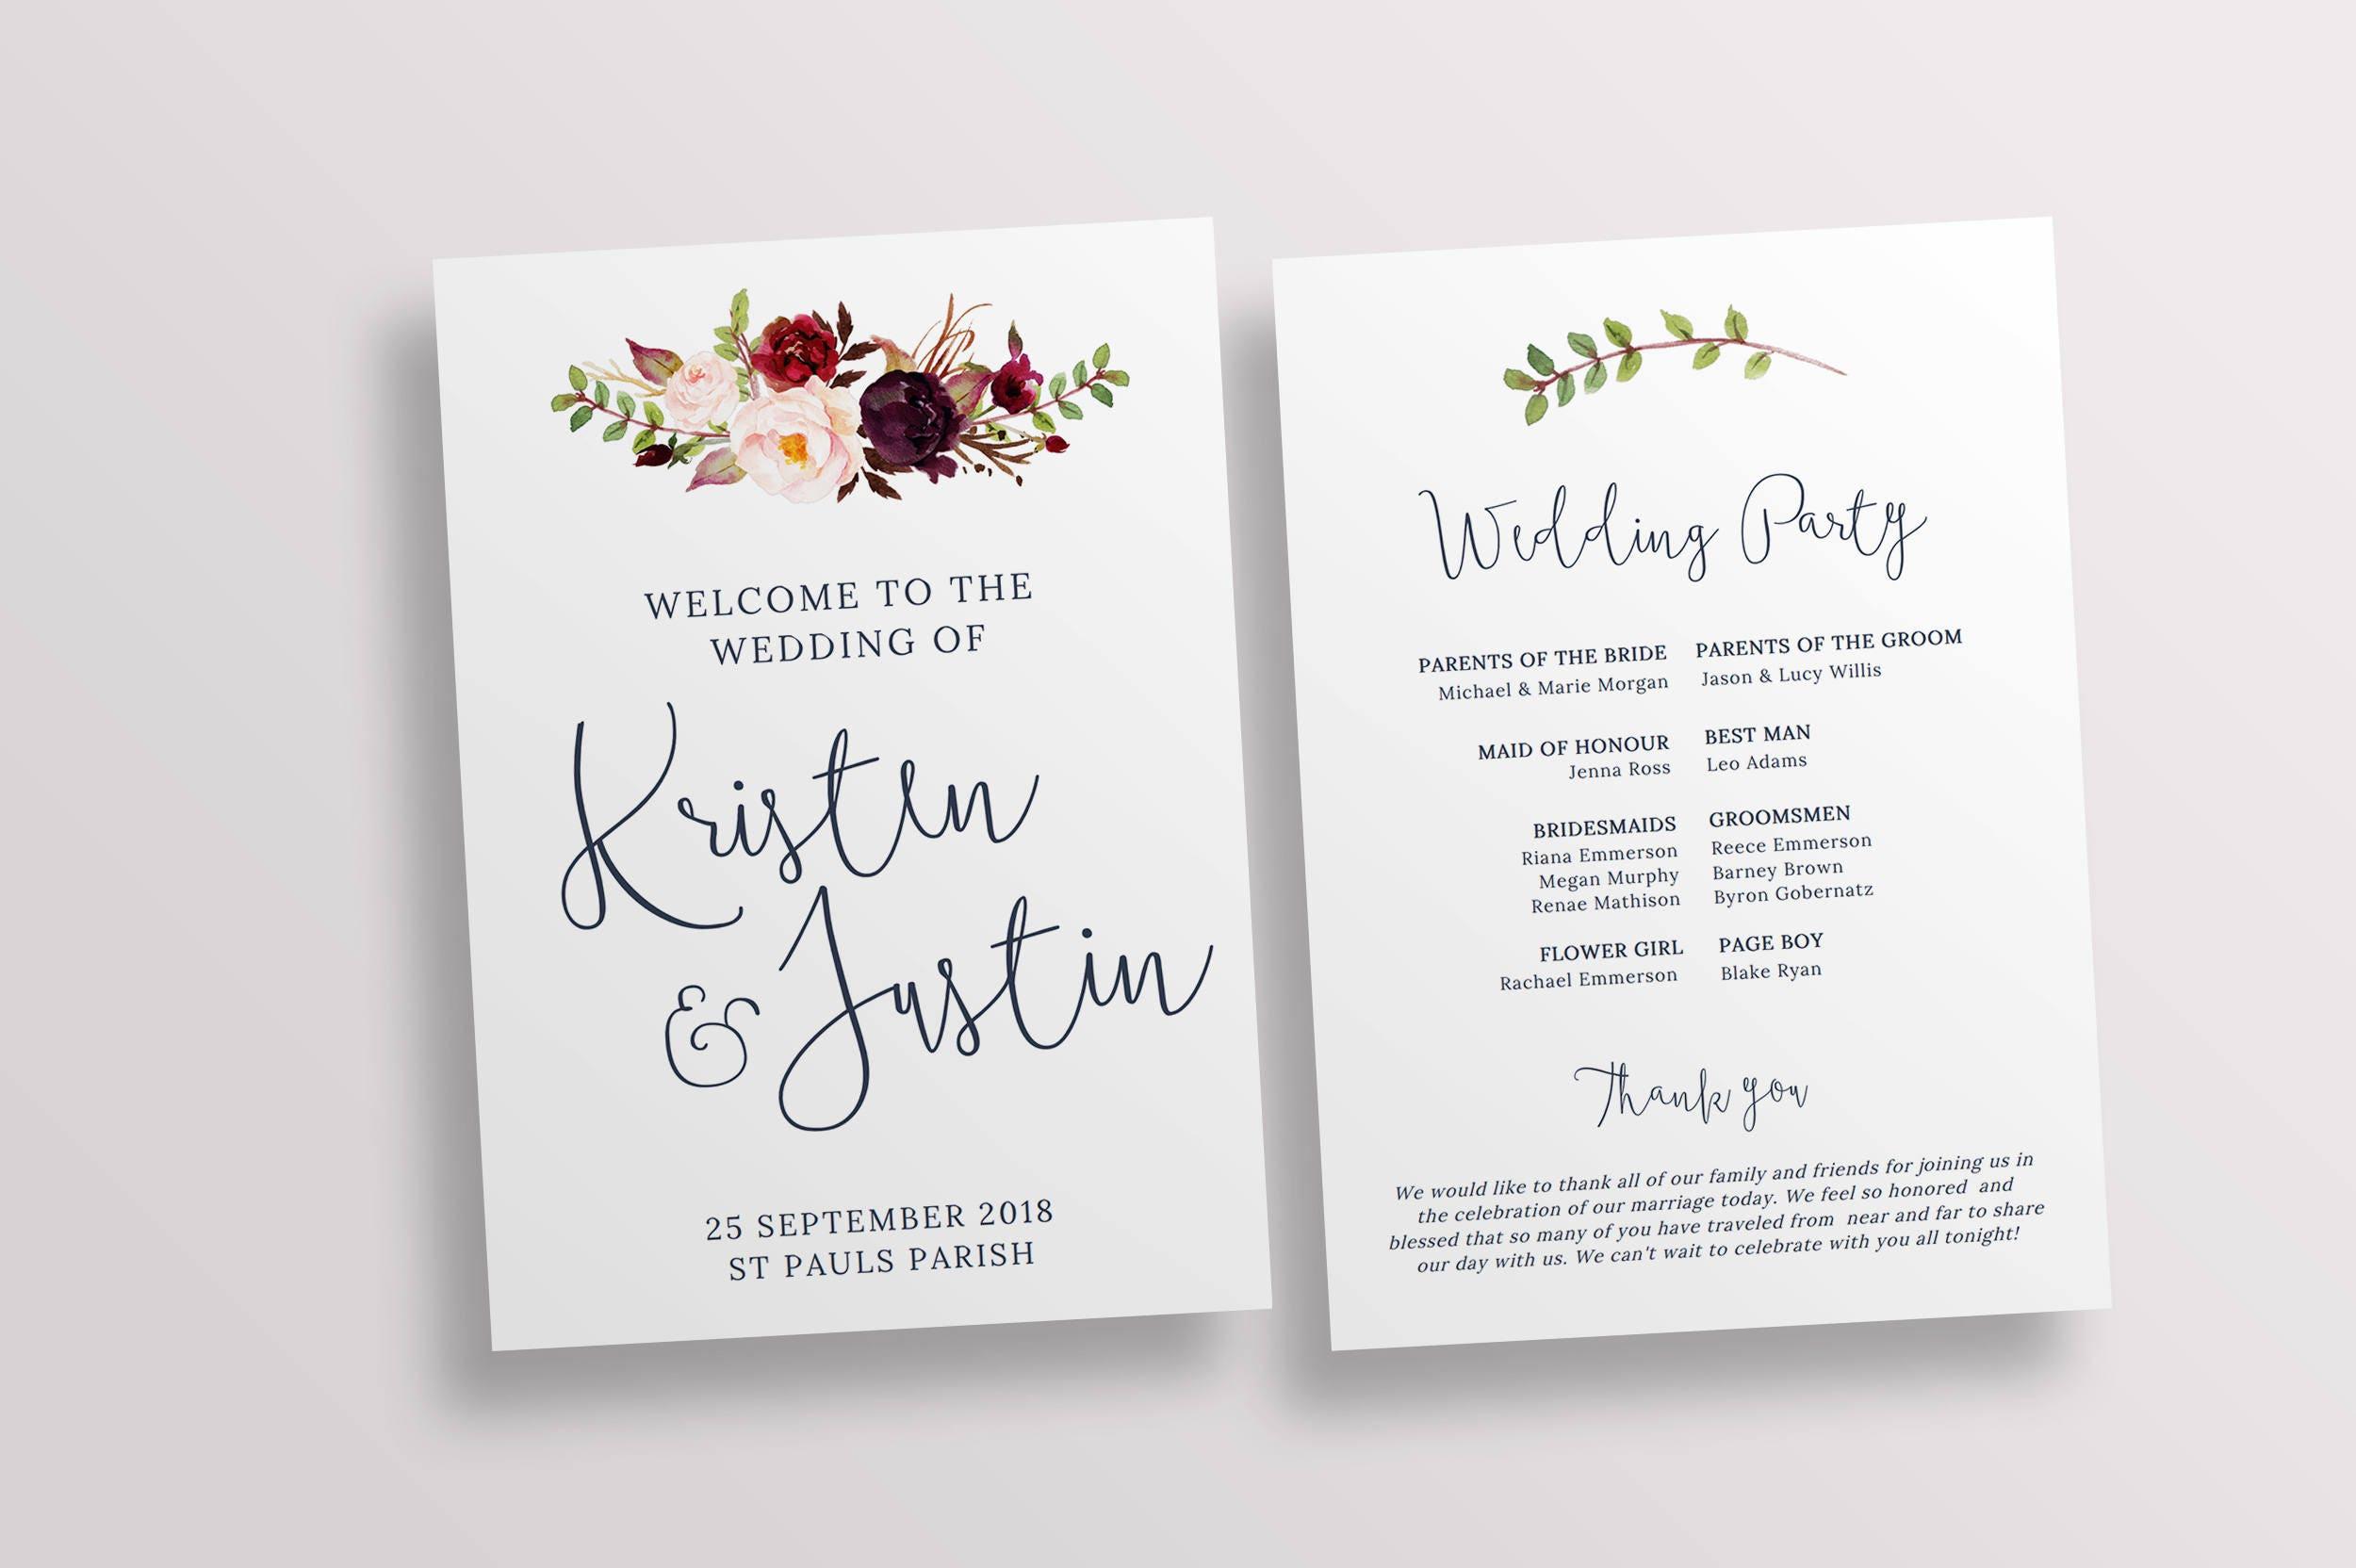 Wedding Ceremony Program.Ceremony Program Wedding Program Church Program Template Wedding Ceremony Printable Program Templett Instant Download 128268